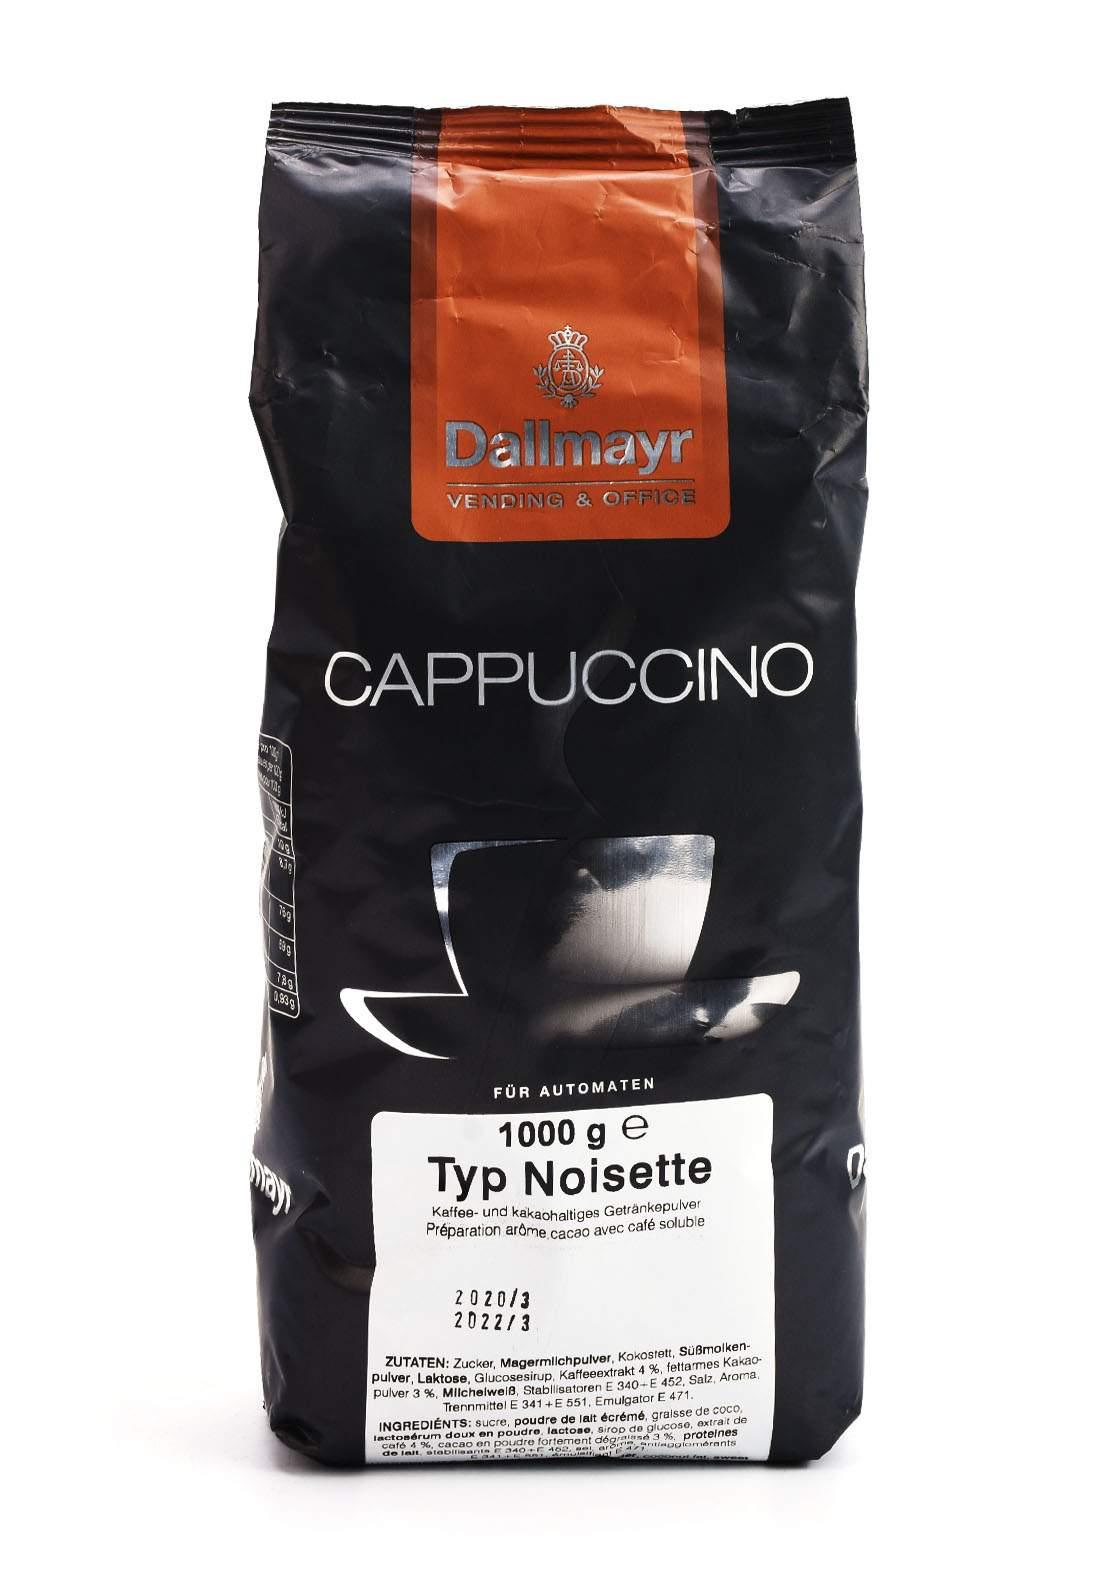 Dallmayr Vending & Office Cappuccino Typ Noisette 1kg كابتشينو